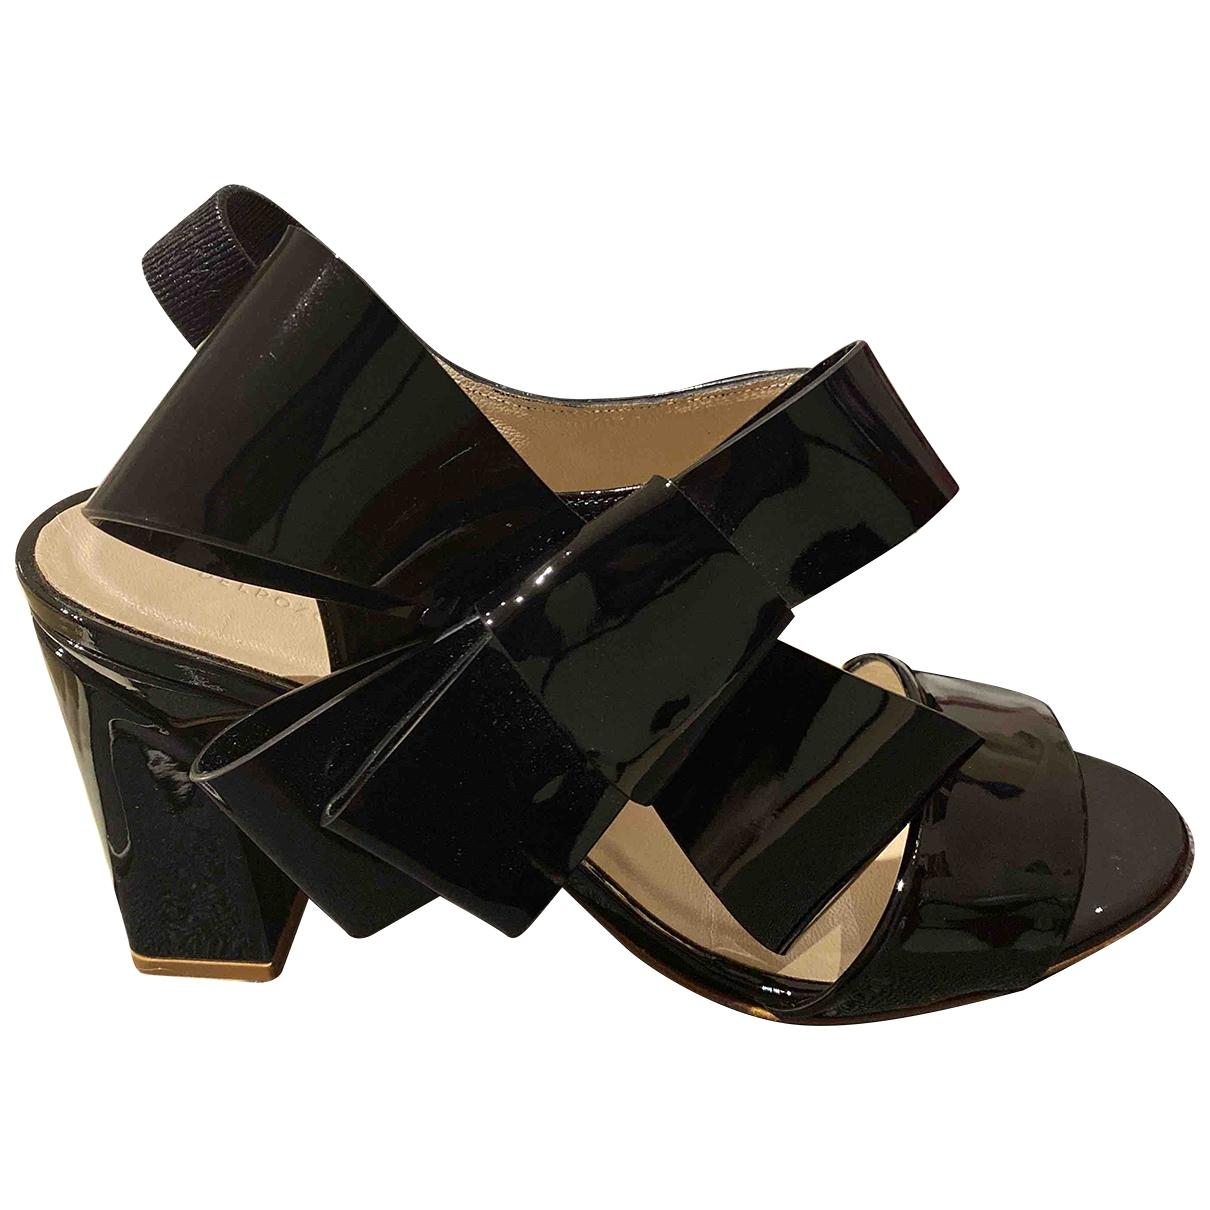 Delpozo \N Sandalen in  Schwarz Lackleder